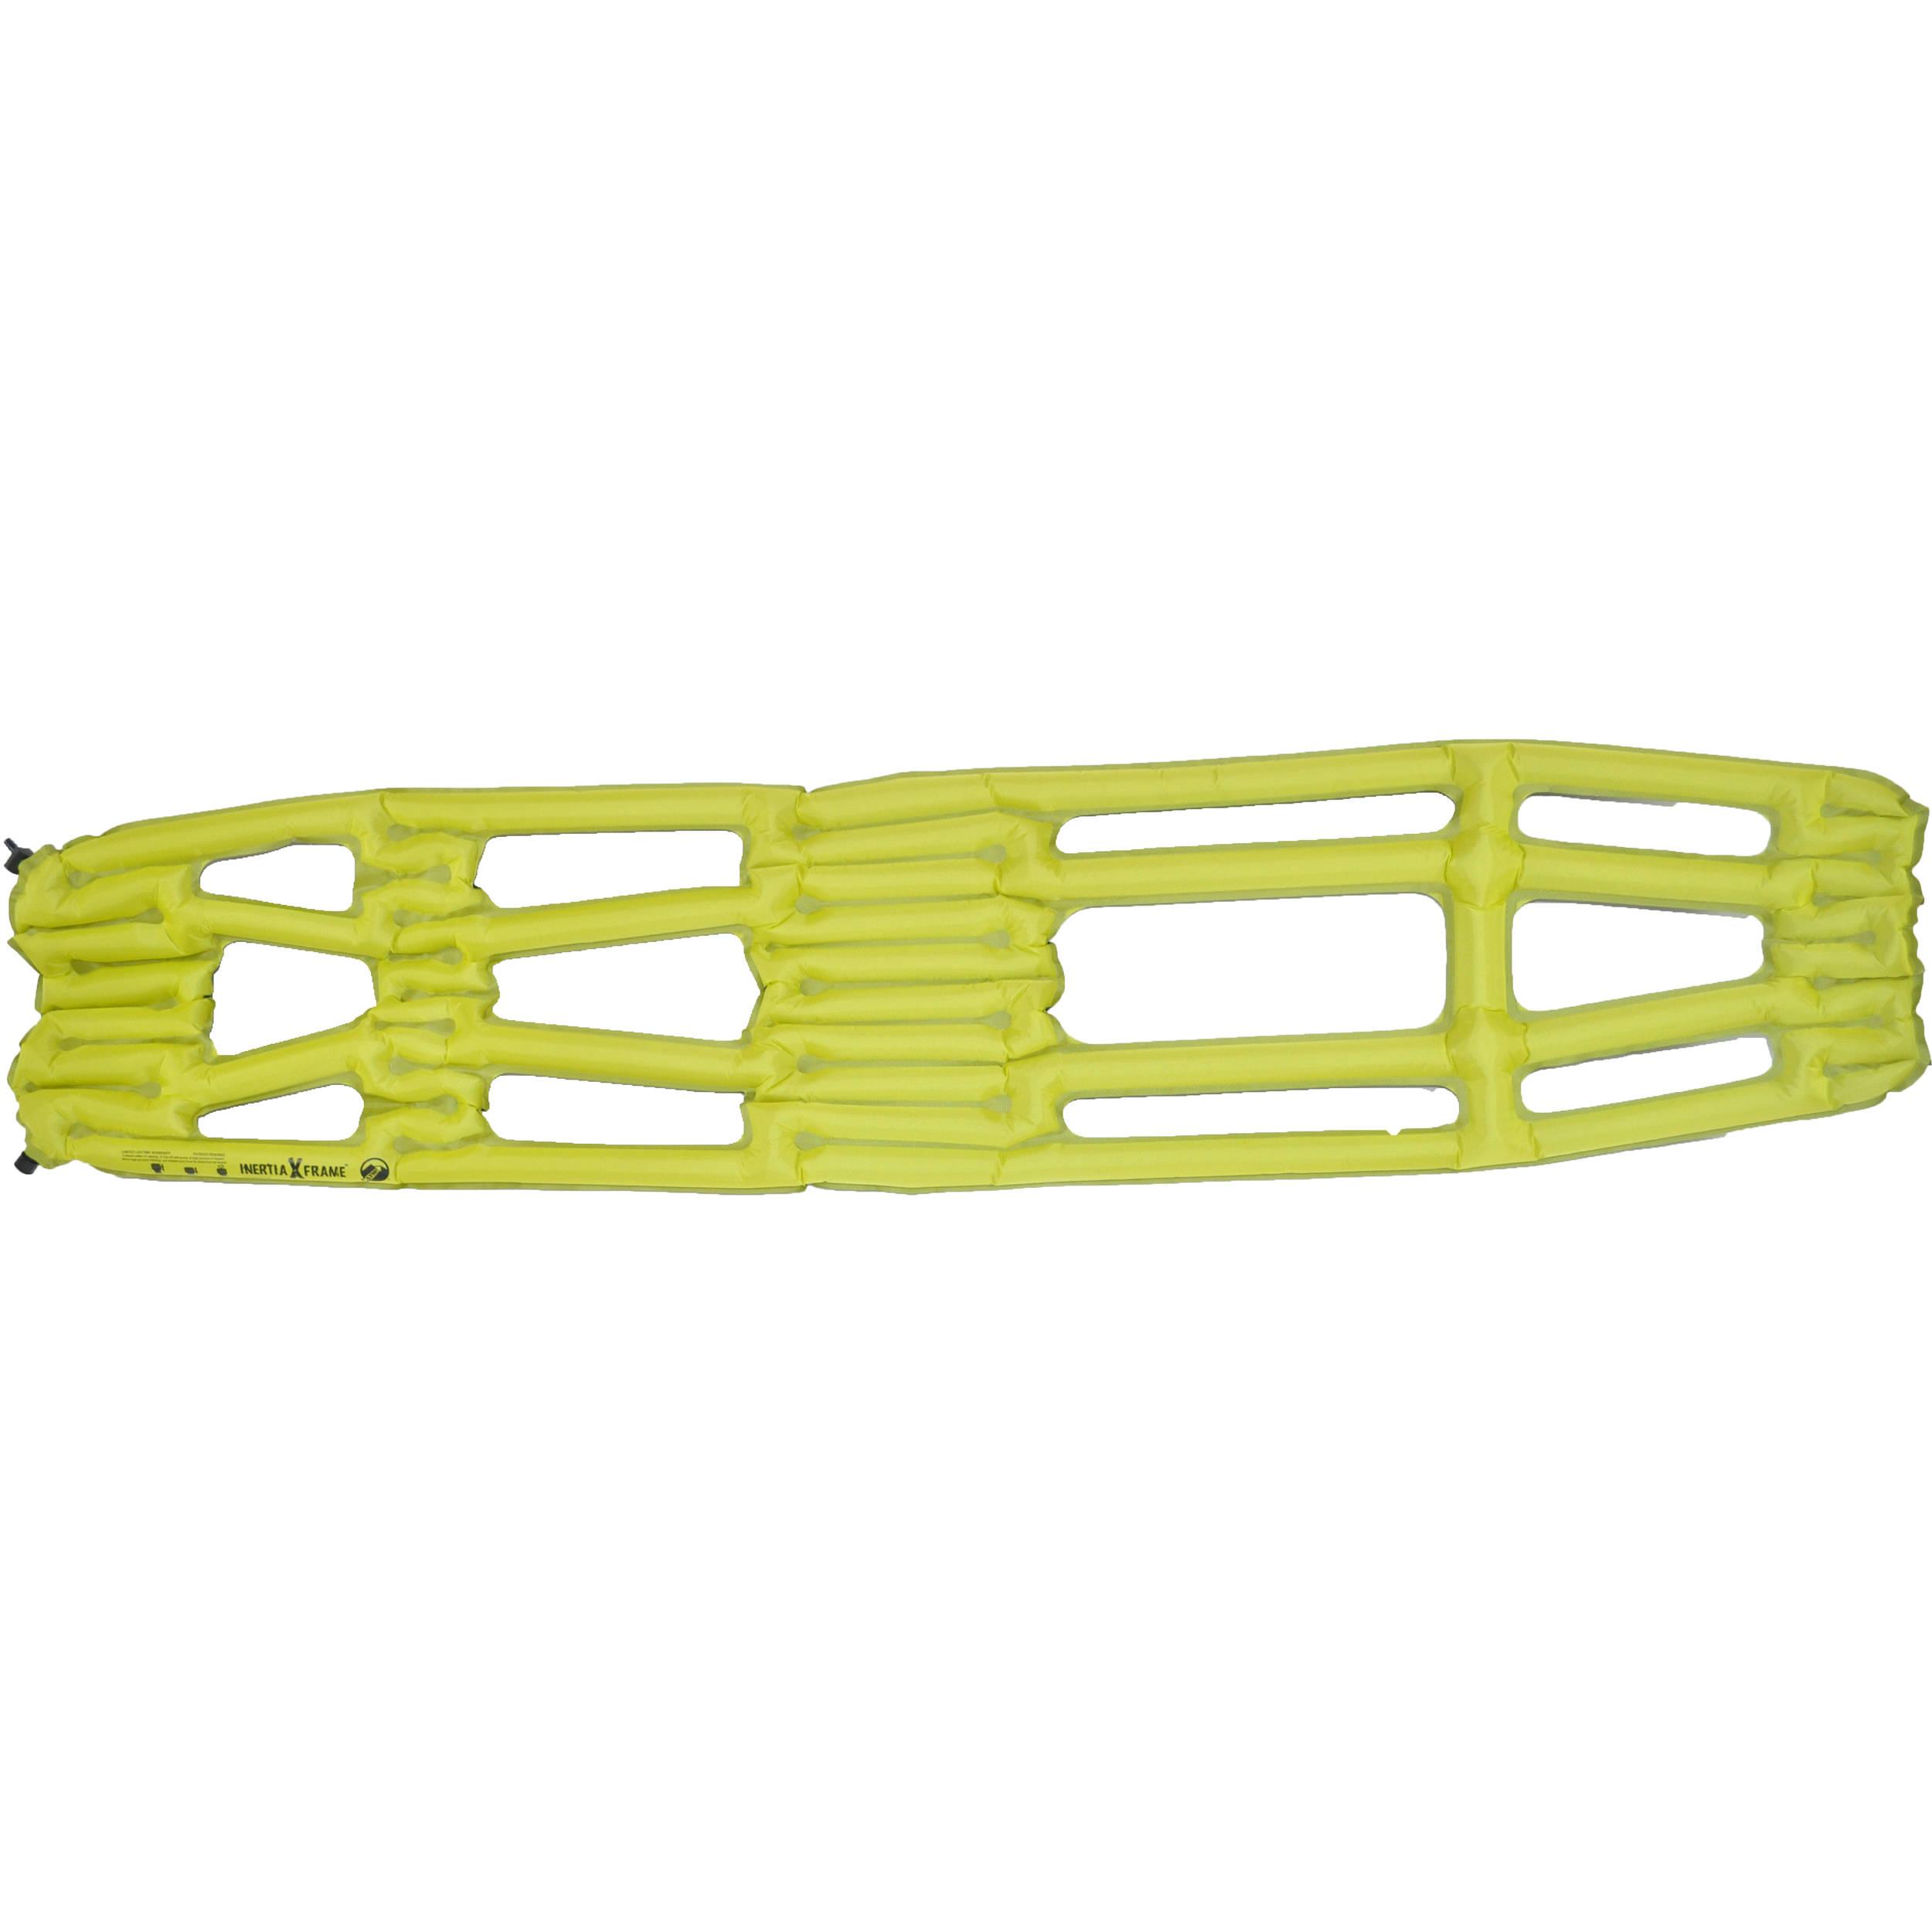 Klymit Inertia X Frame Inflatable Sleeping Pad 06IXRD01A B&H